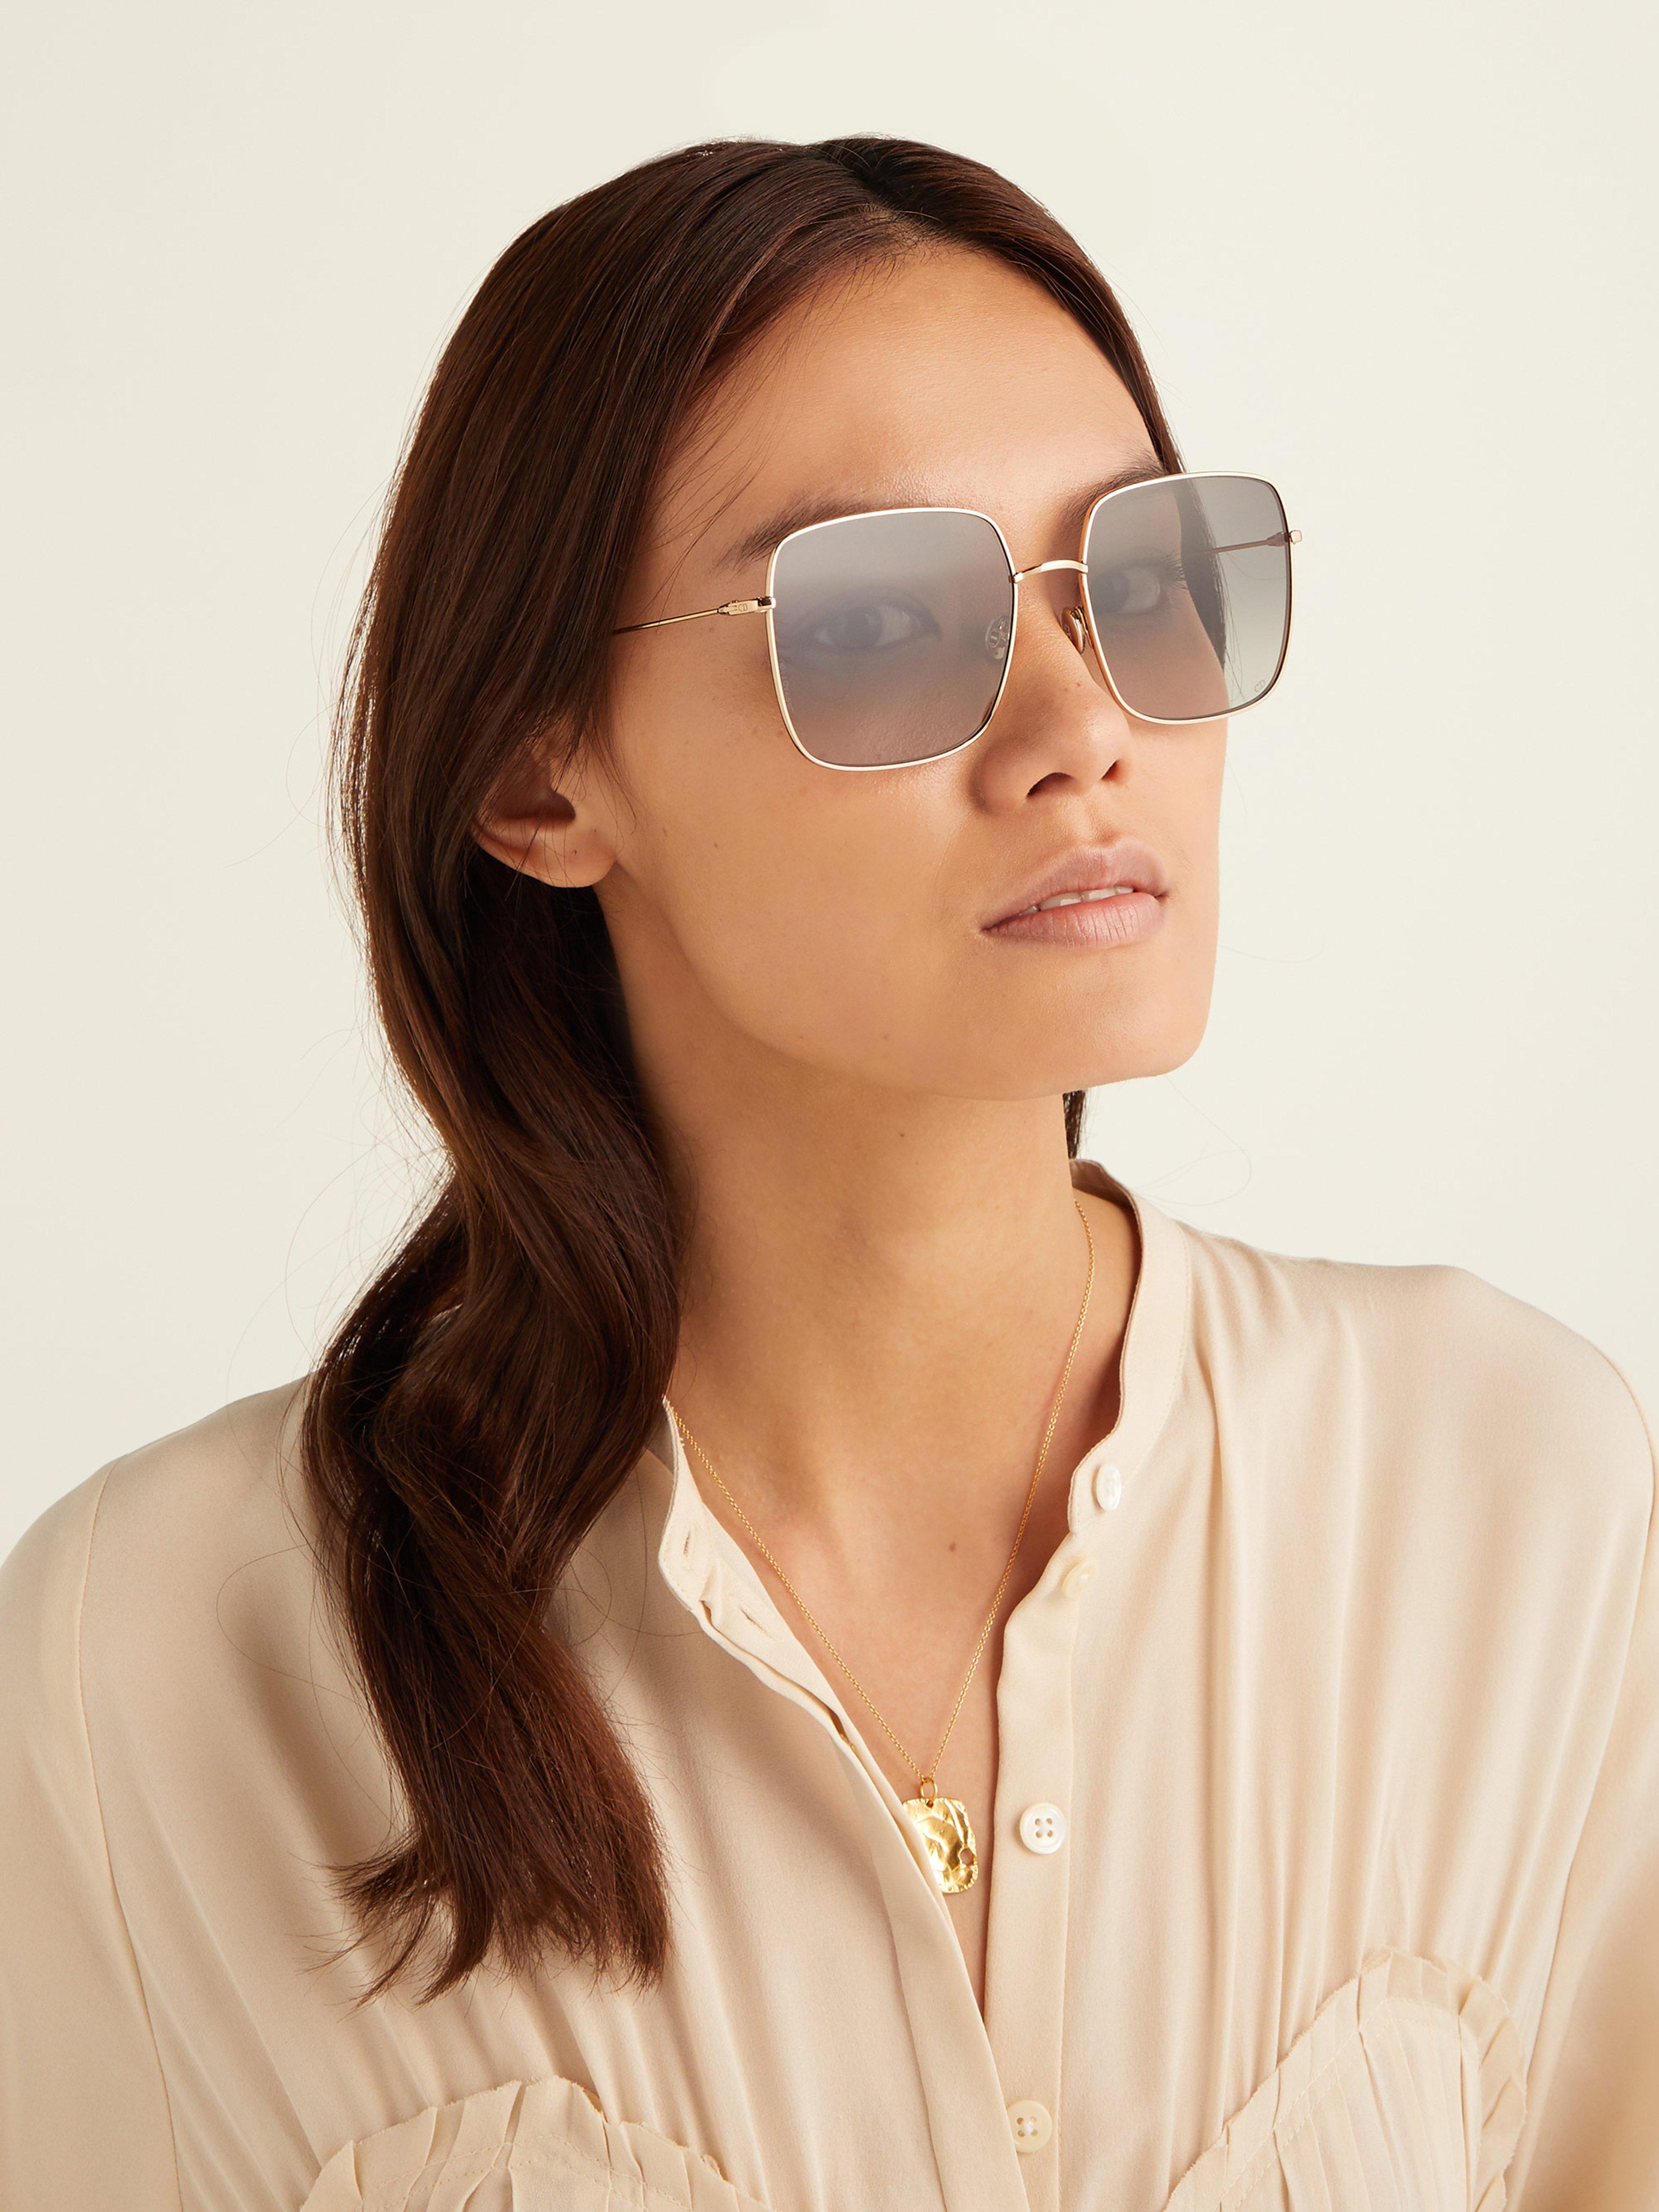 fbc0504fb0fe ... Diorstellaire1 Square Frame Sunglasses - Lyst. View fullscreen